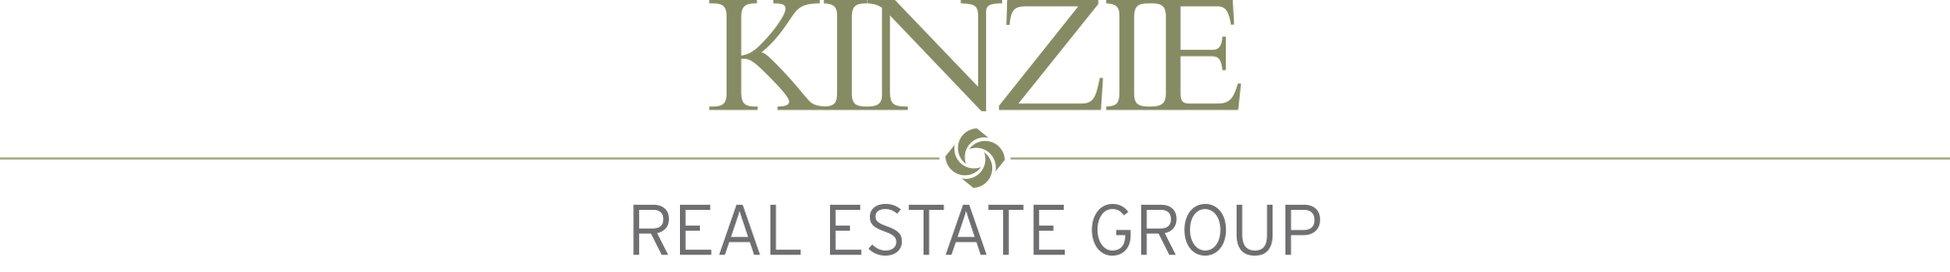 https://kinziegroup.com Logo